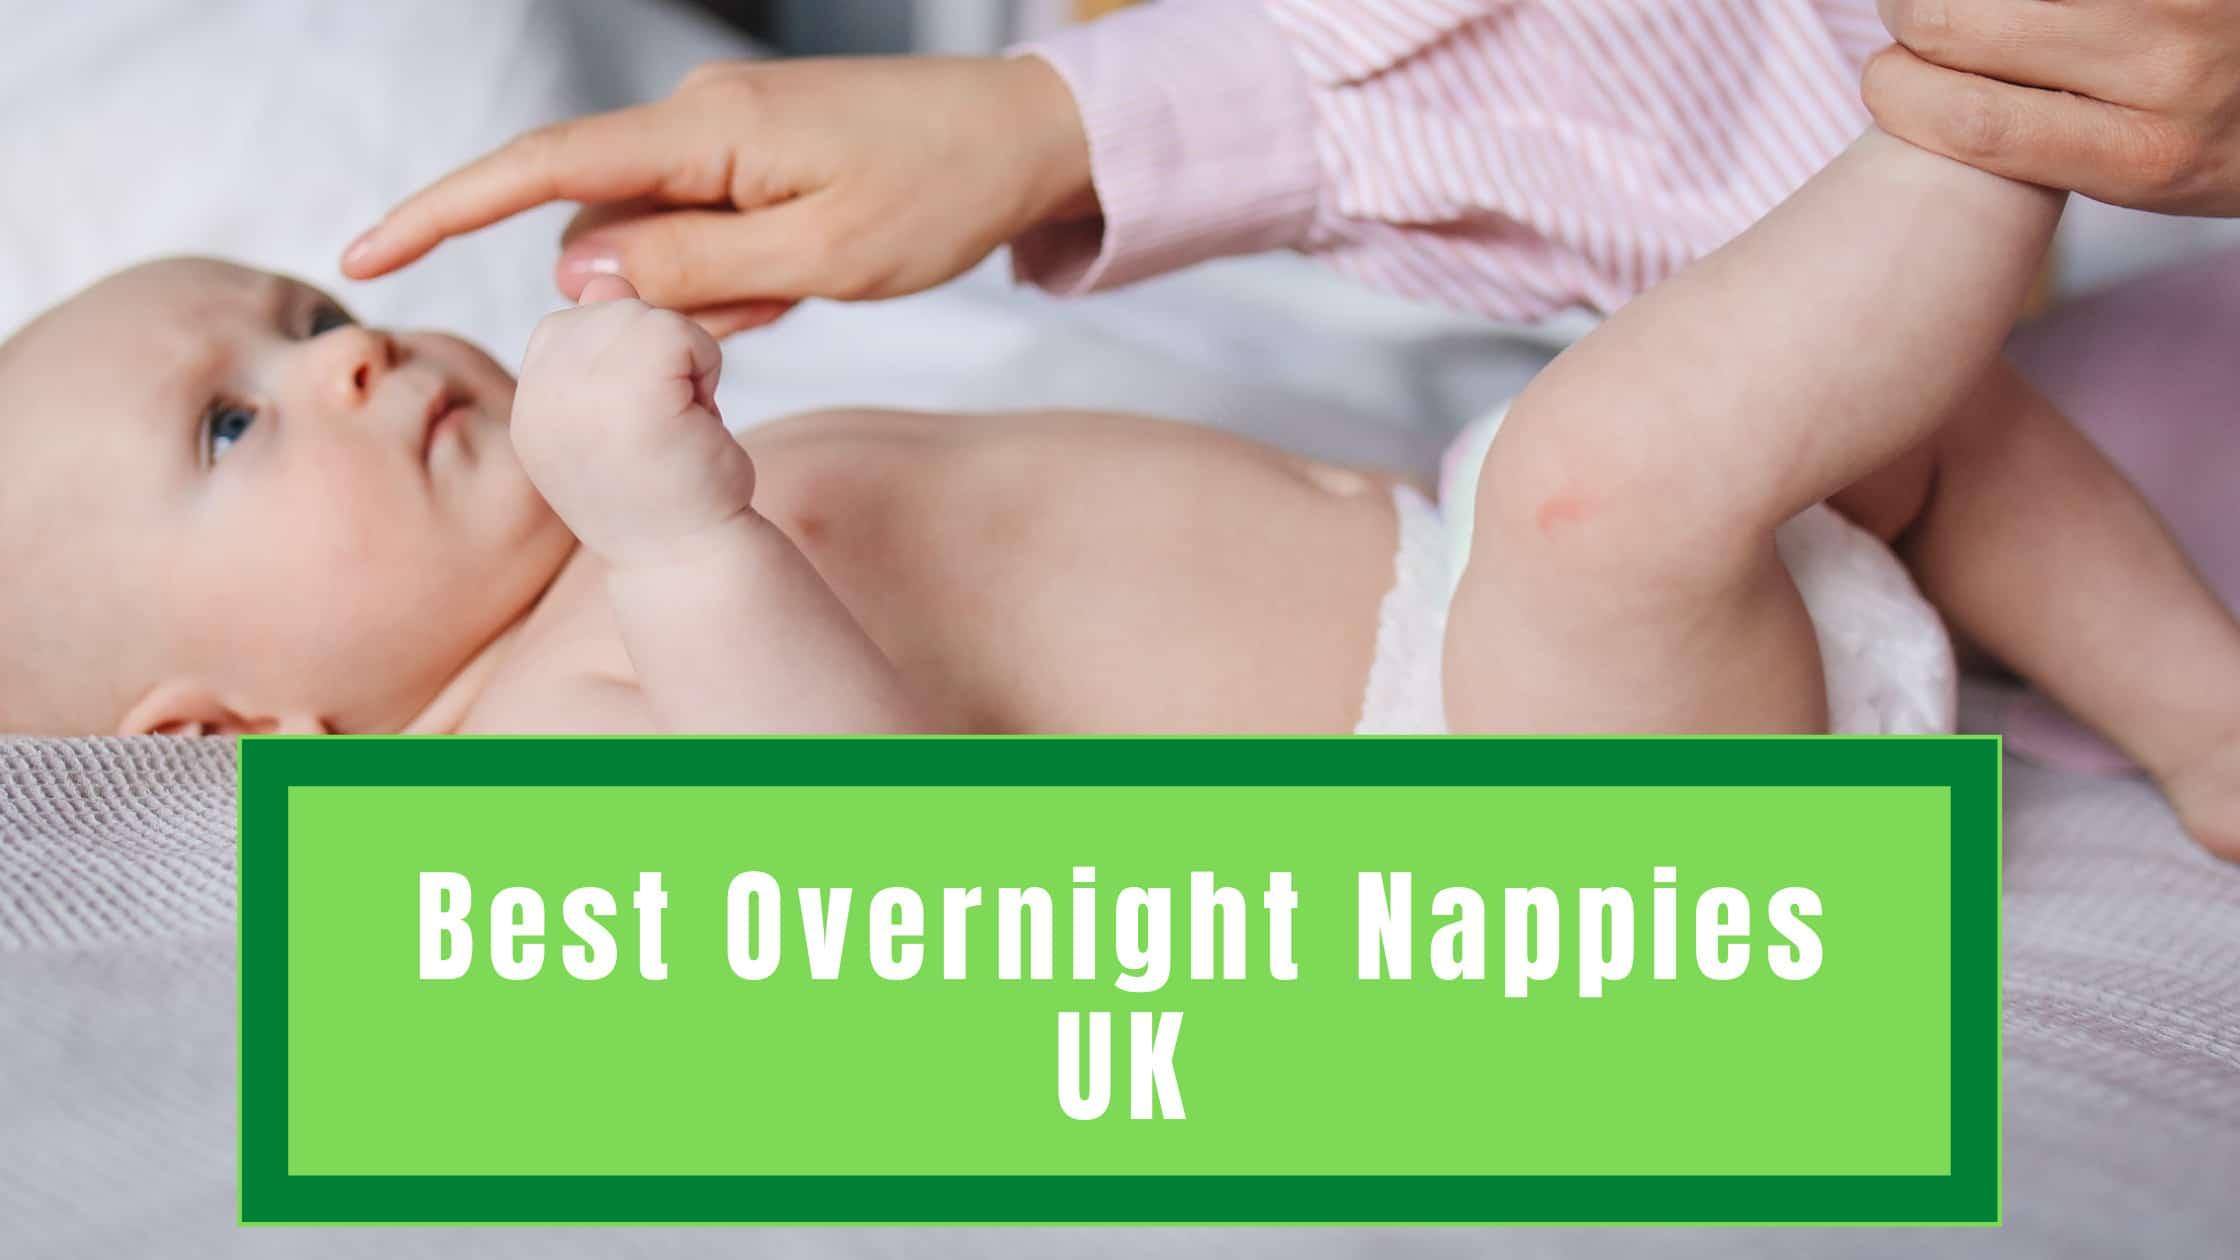 Best Overnight Nappies UK